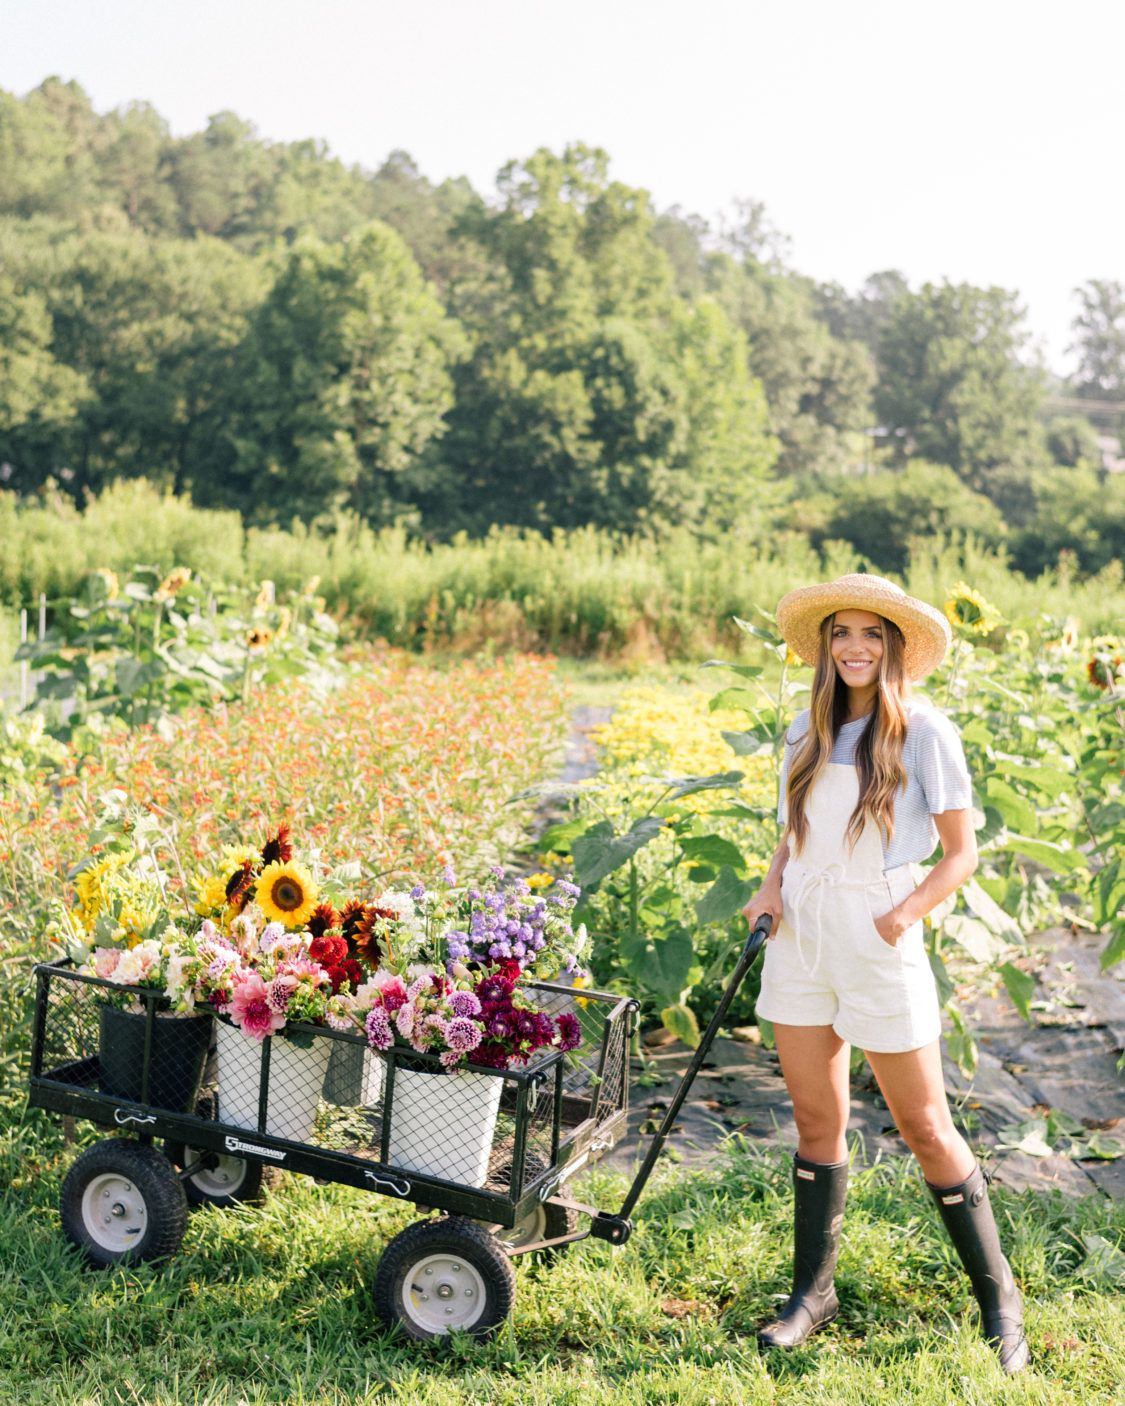 b436c778fe538b97b4f2ac616c496c1e - Best Clothes To Wear For Gardening